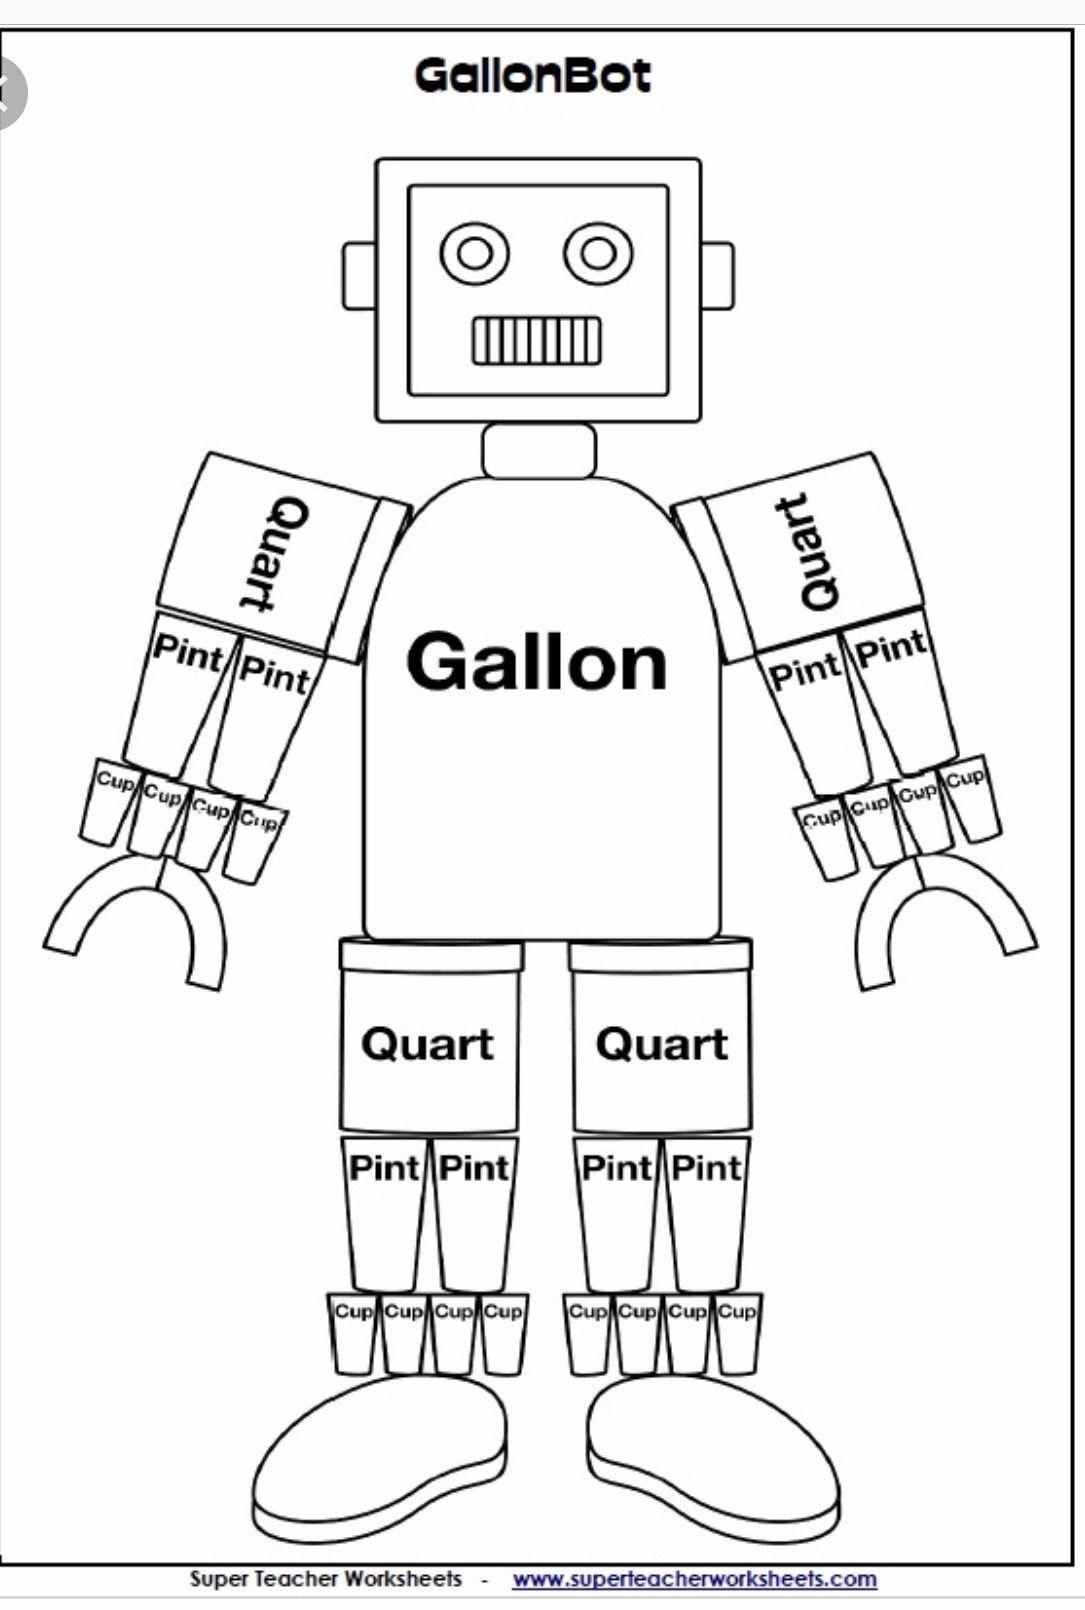 Pin by Kelly Simmons on 3rd & 4th grade math Gallon man